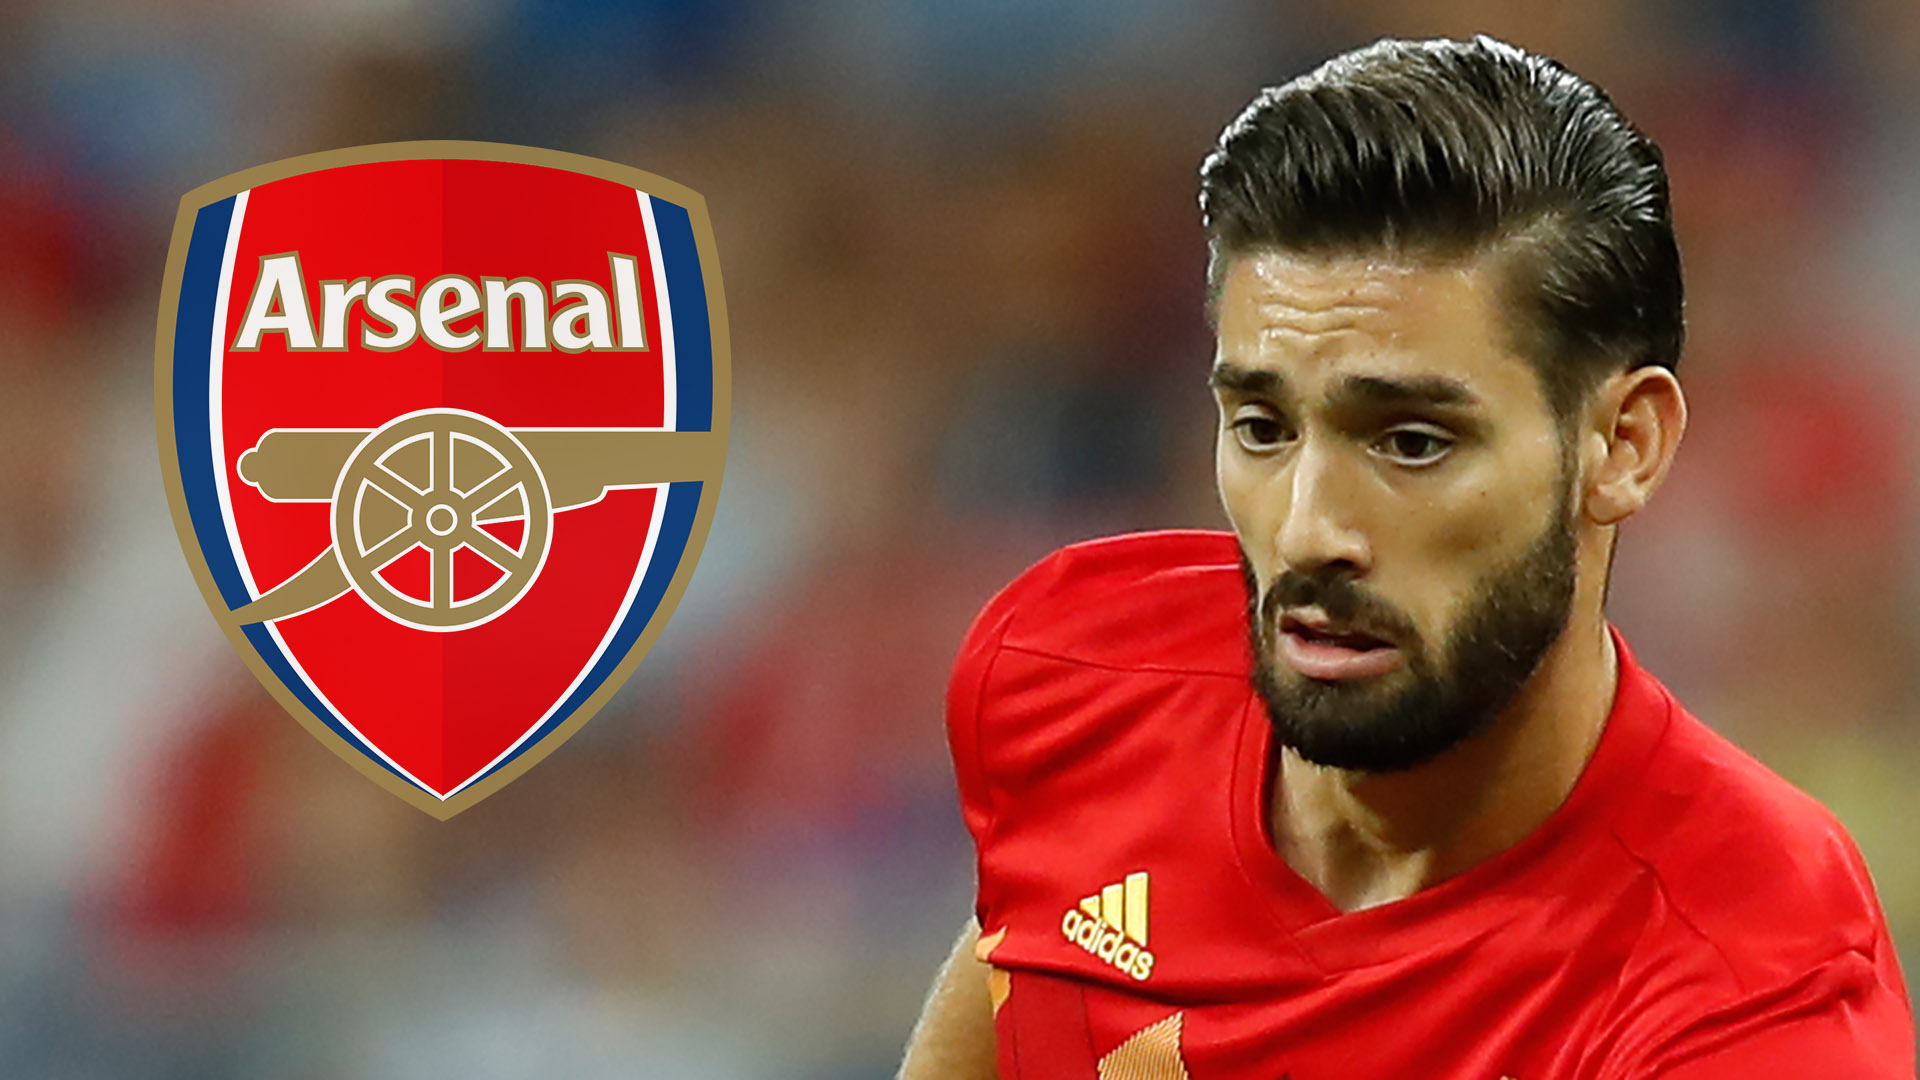 Carrasco's Premier League ambition opens transfer door for Arsenal